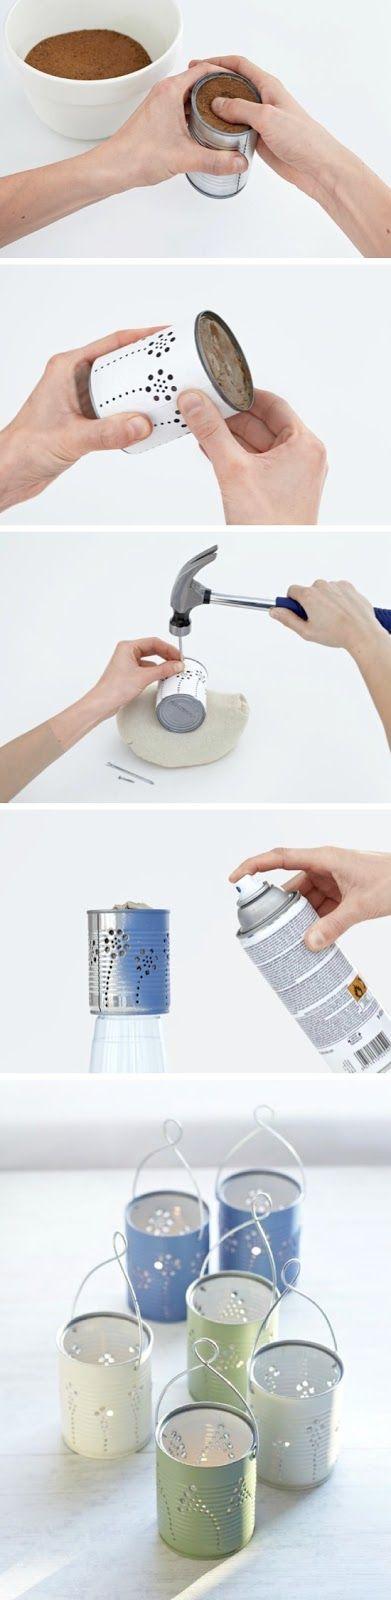 DIY-Tin-Can-Lanterns-Craft-By-Photo.jpg (391×1600)